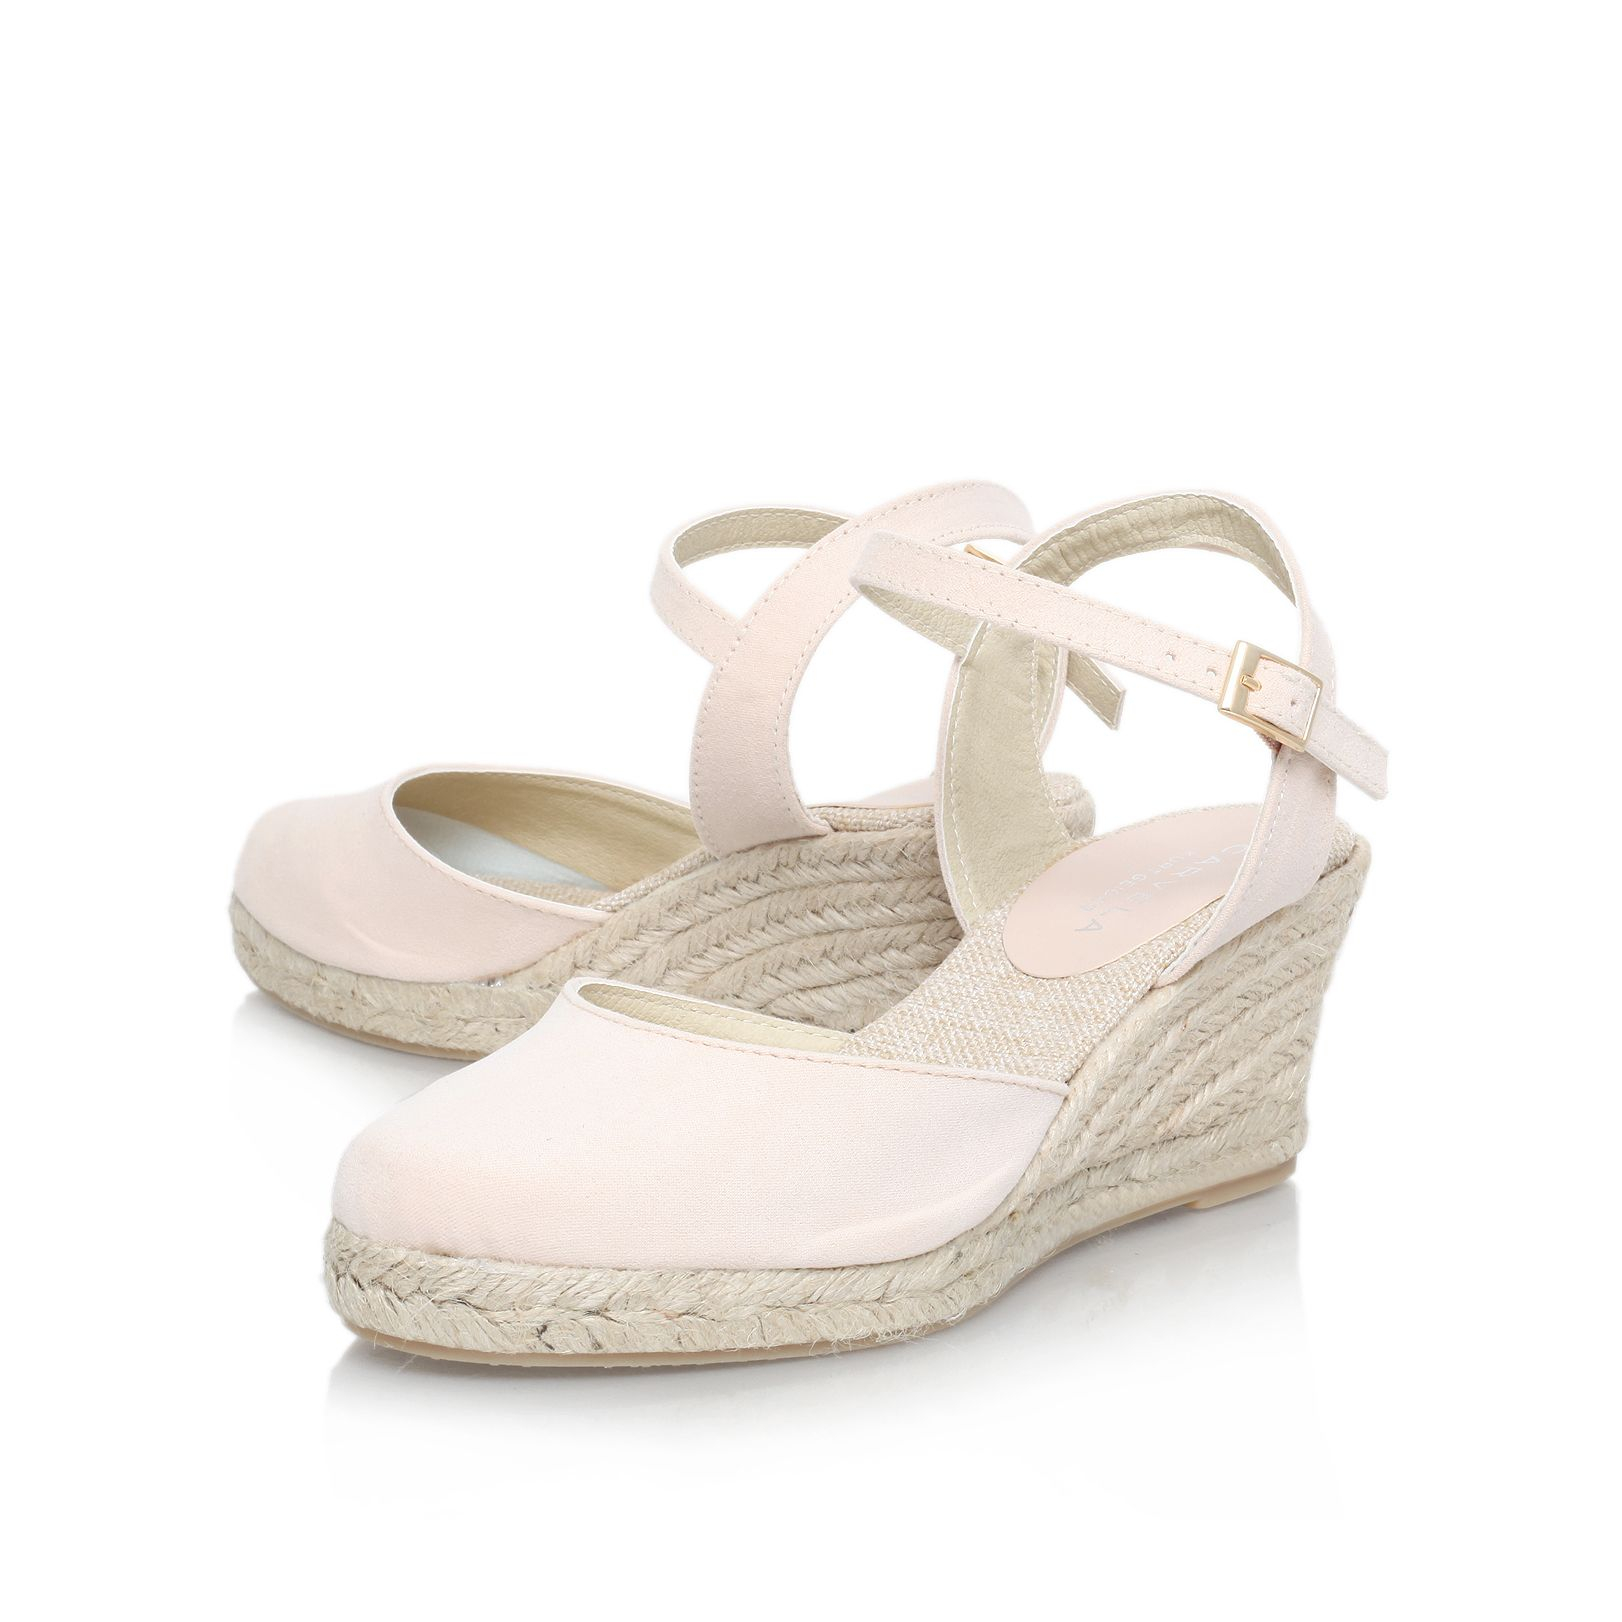 carvela kurt geiger sabrina mid wedge heel court shoes in